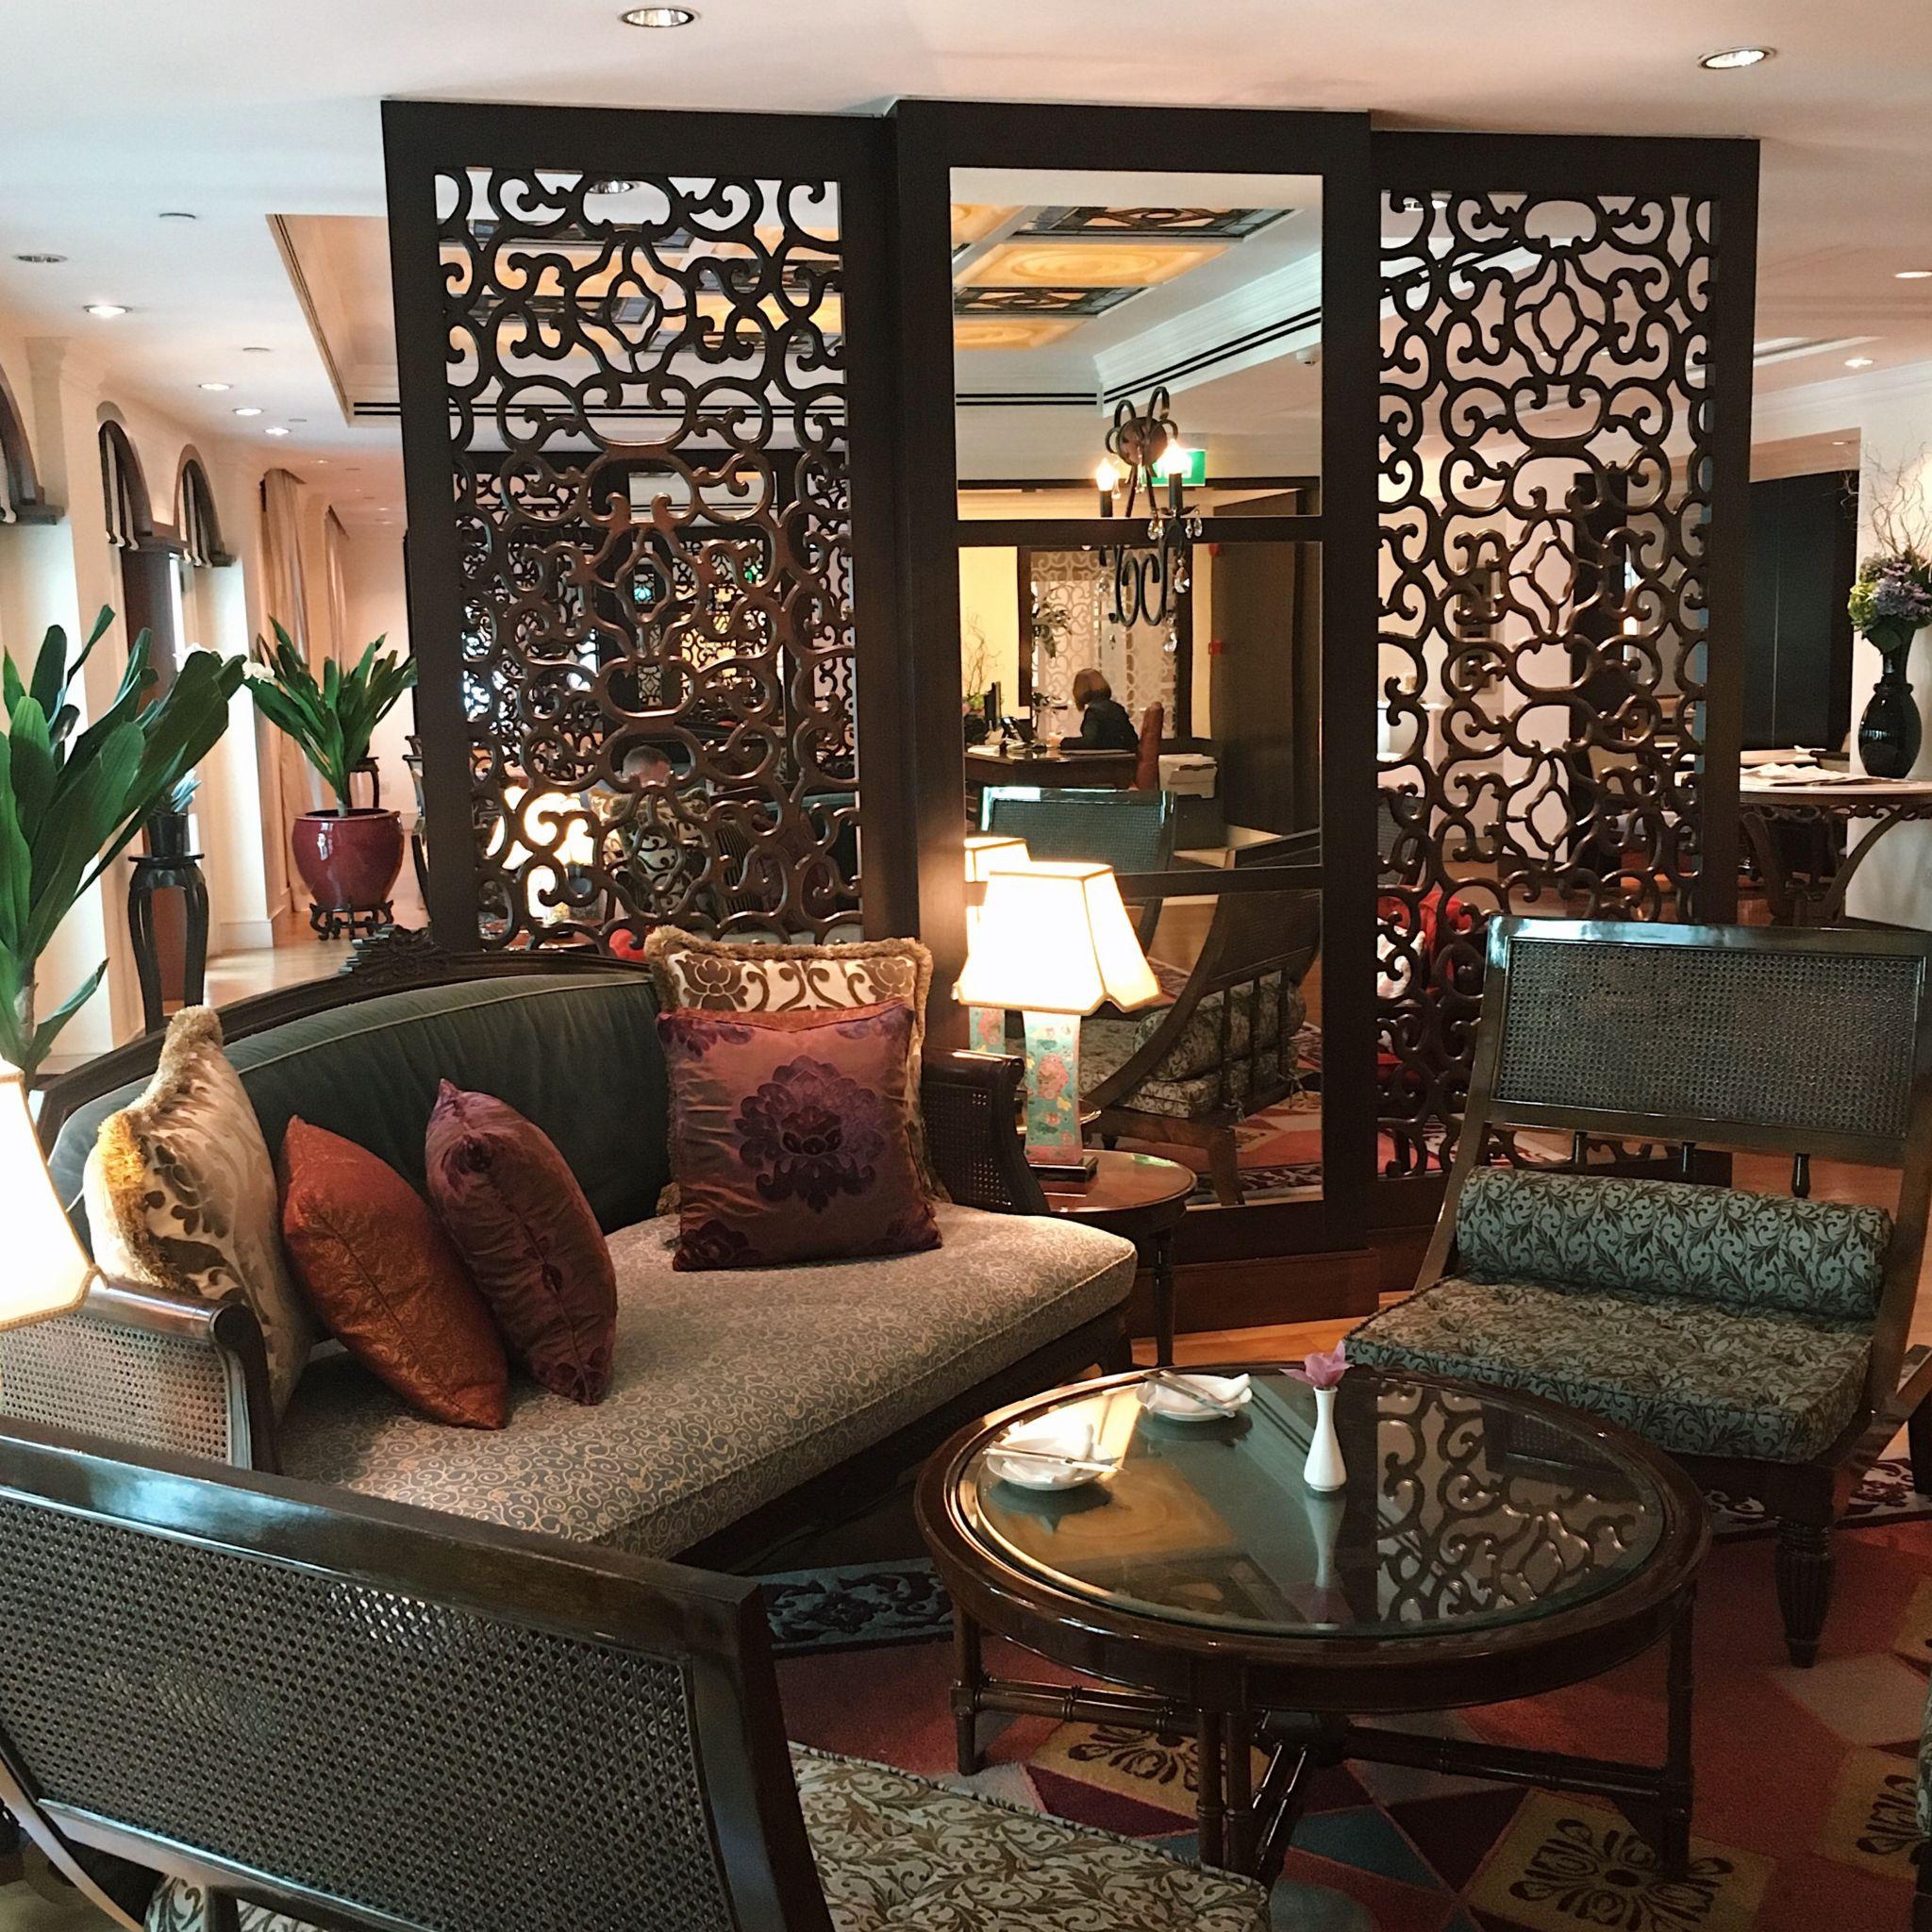 Afternoon High Tea - Club InterContinental Lounge